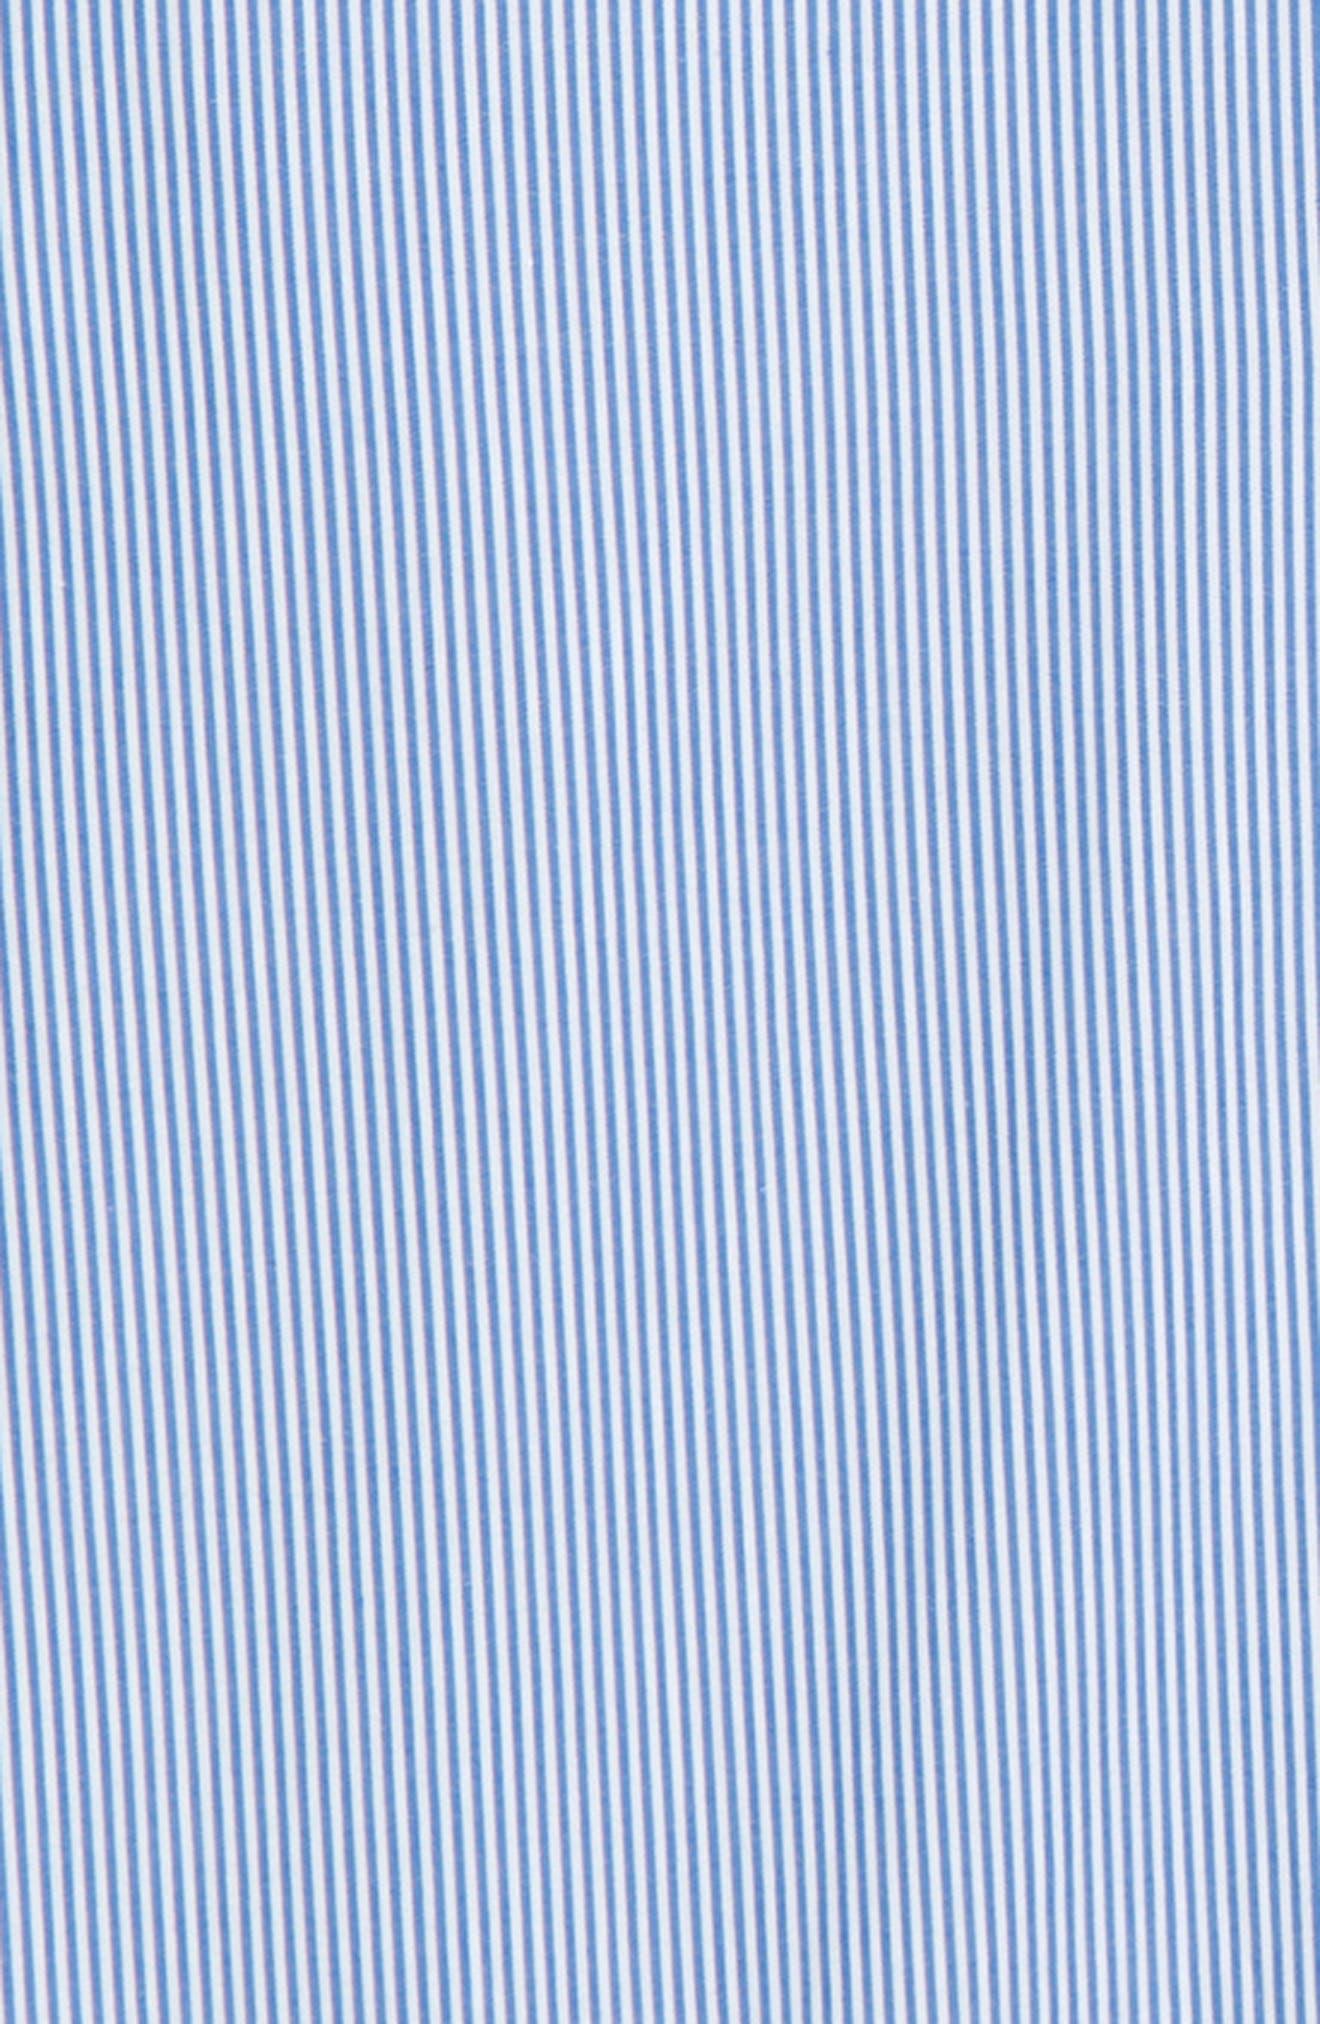 Stripe Dress Shirt,                             Alternate thumbnail 2, color,                             Blue Stripe